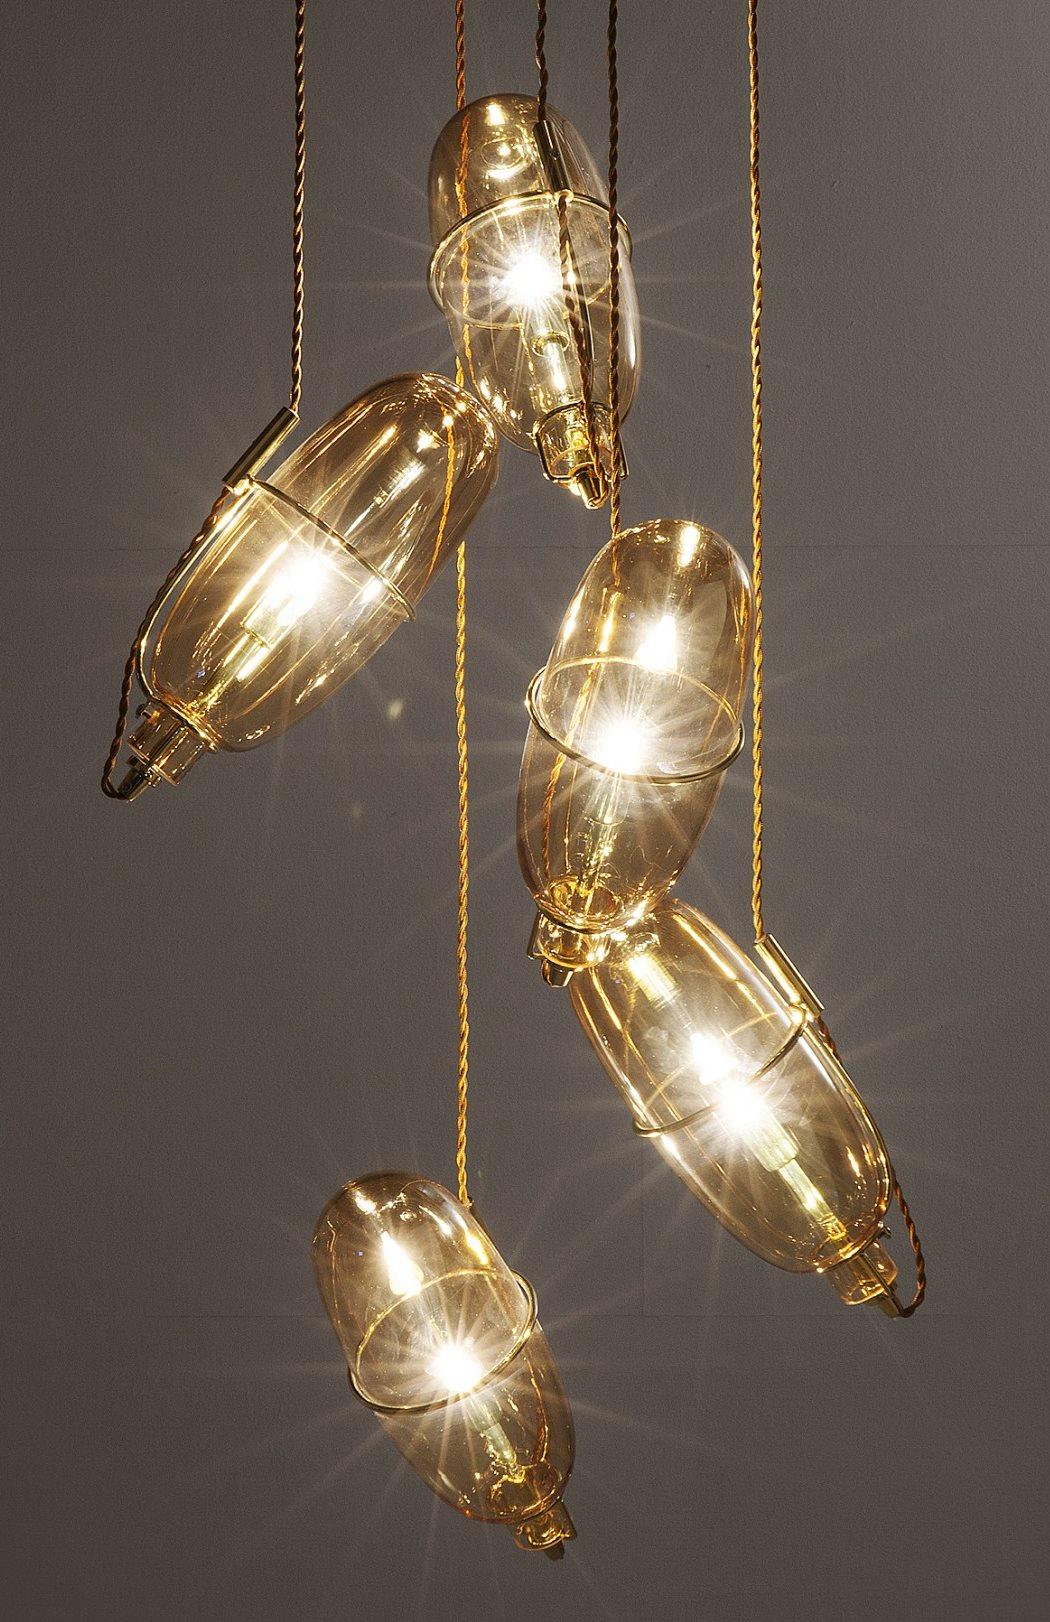 kare lampen produkte im freudenhaus online shop kaufen. Black Bedroom Furniture Sets. Home Design Ideas